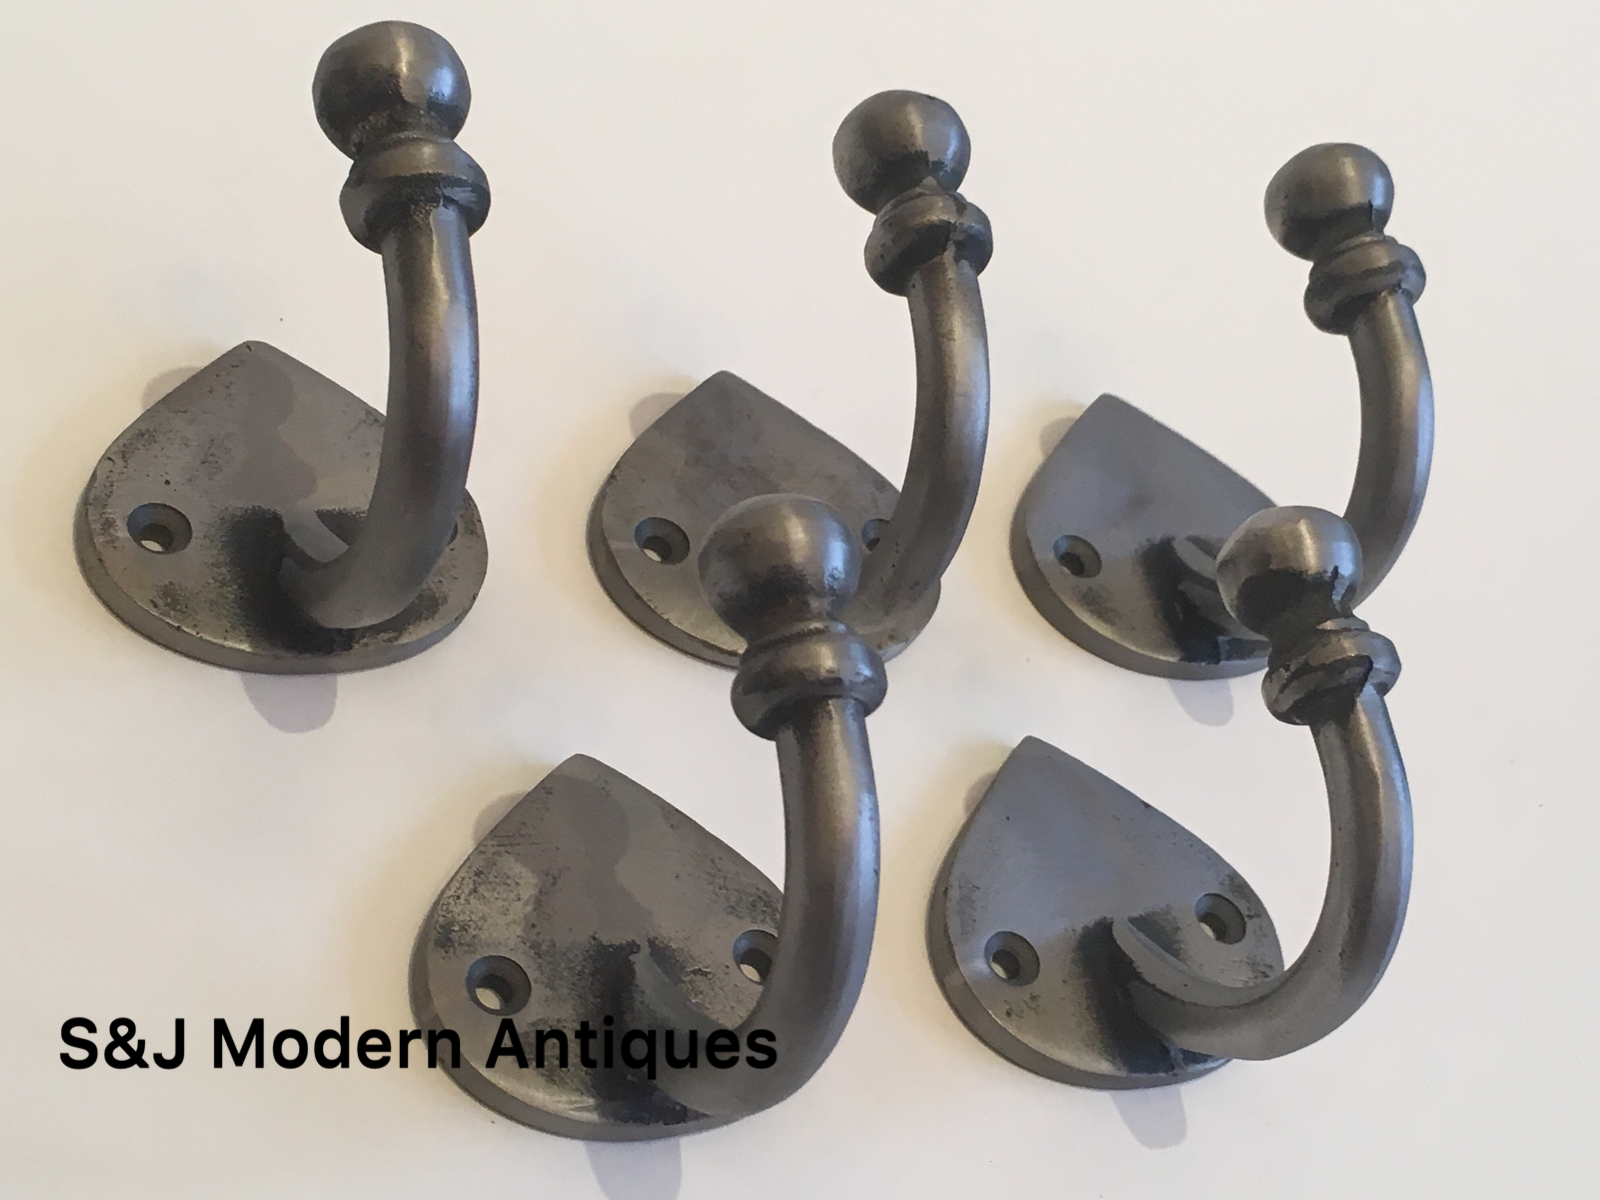 Single Coat Hook Iron Antique Modern Spearhead Vintage Black Grey Hat Rack Set 5 7